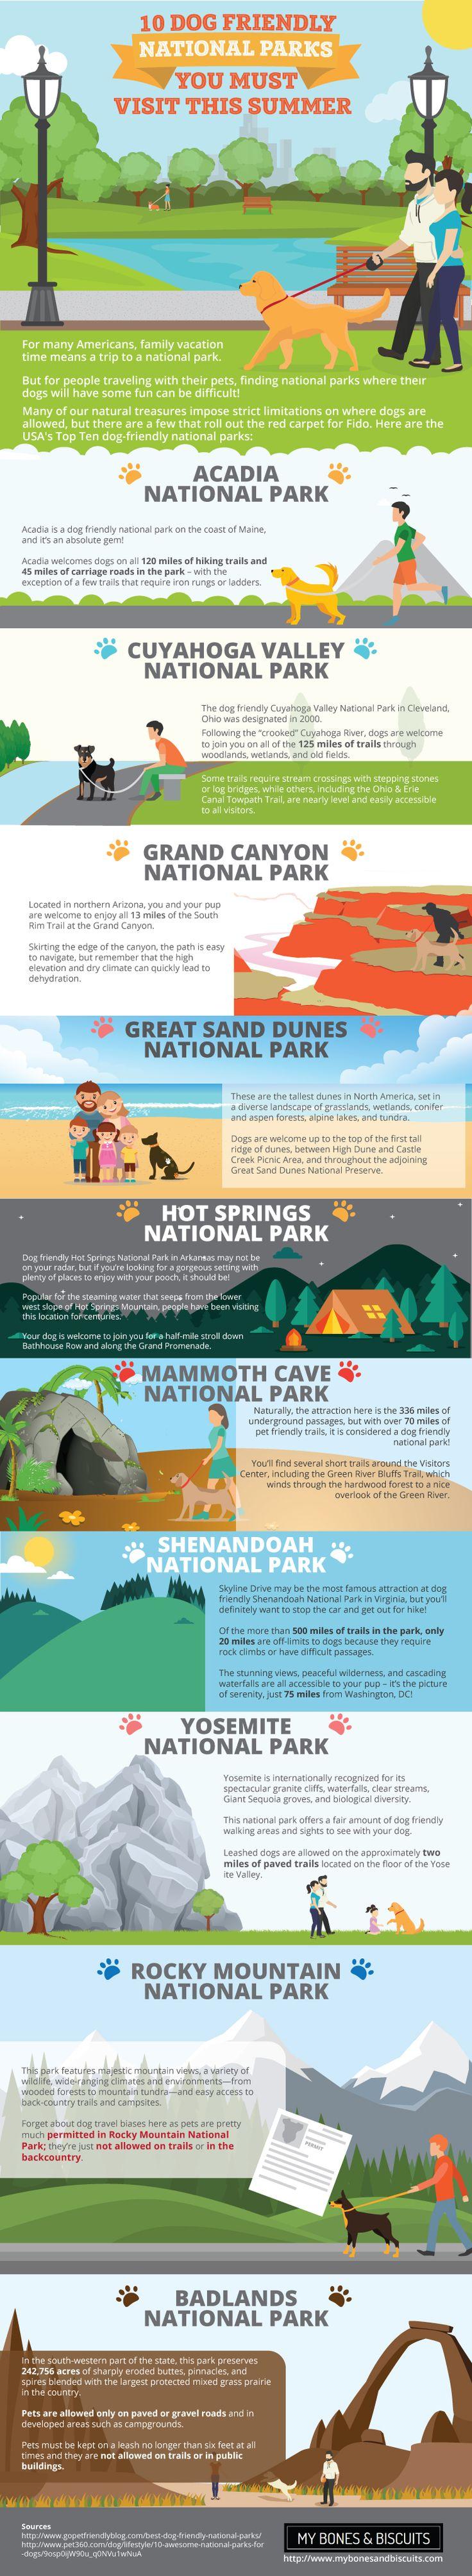 Dog Friendly National Parks